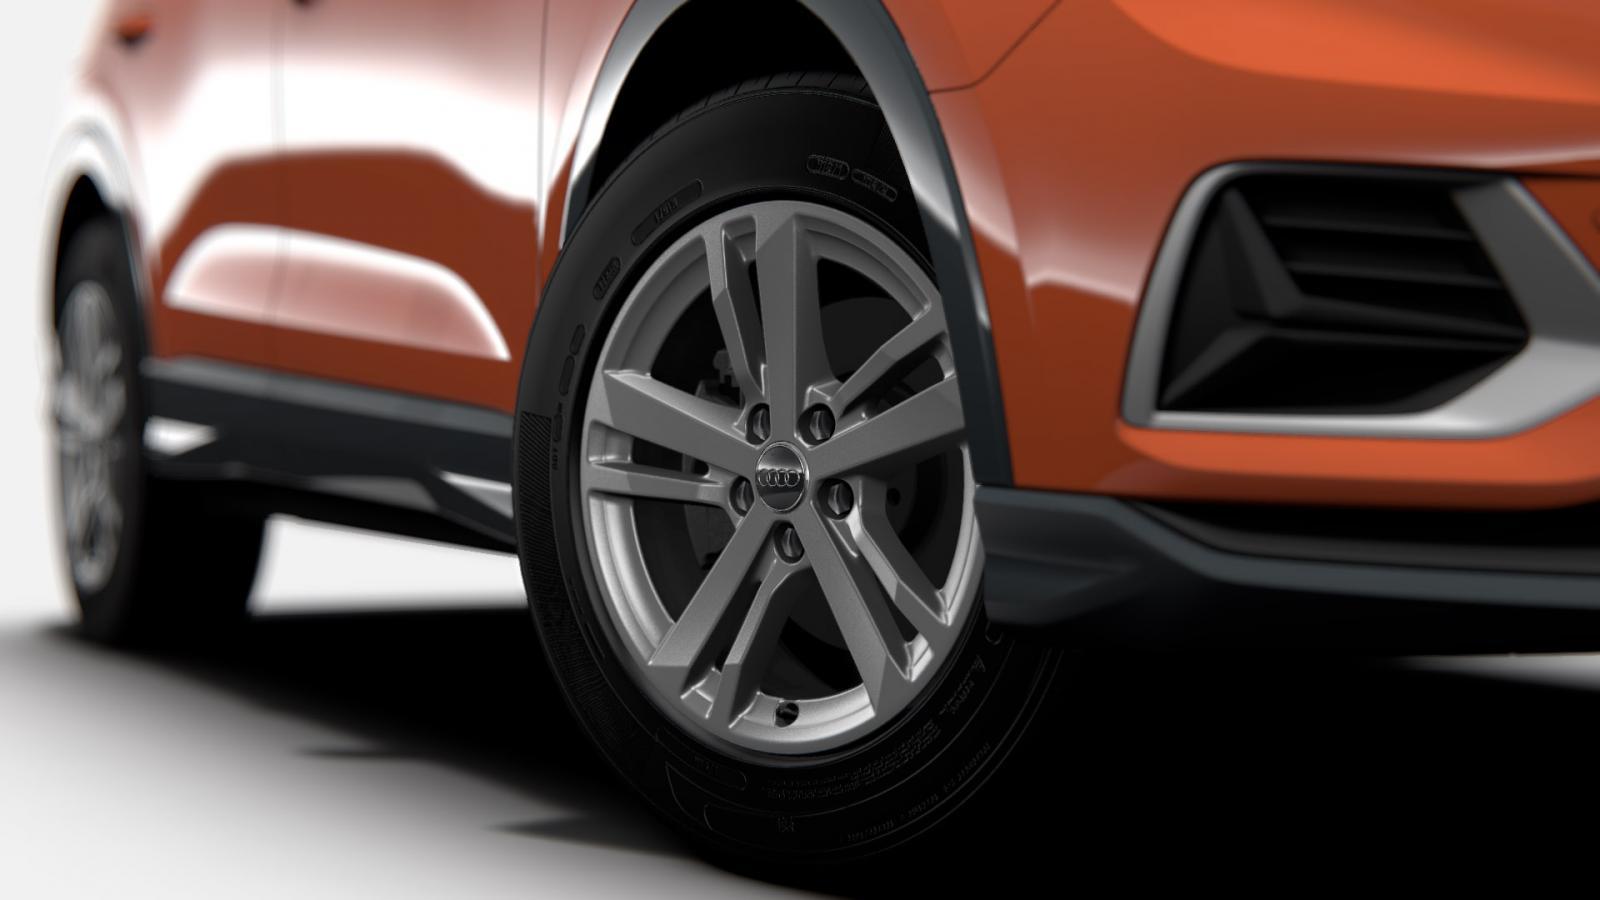 La Audi Q3 2020 es visualmente atractiva